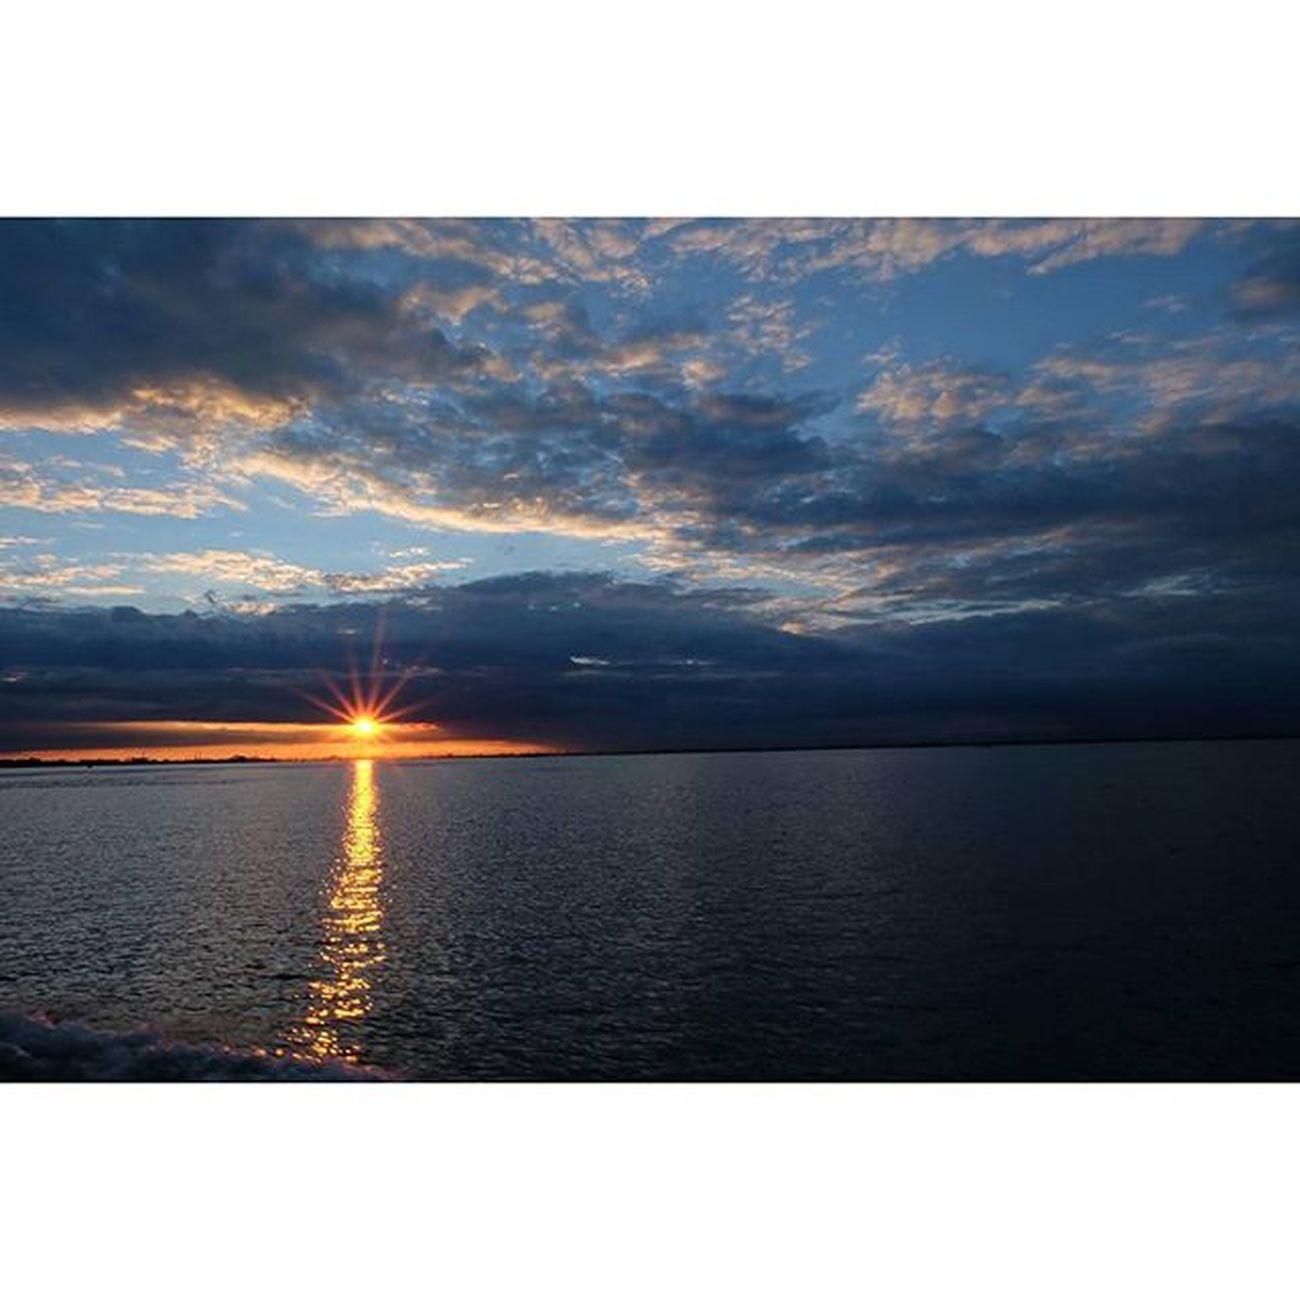 Sunset in Venice.. 💥🌅 Sunsetvenice Nofilter Noedit Fujifilm_xseries Fujifilm Beautifuldestinations Sunset Goldensun